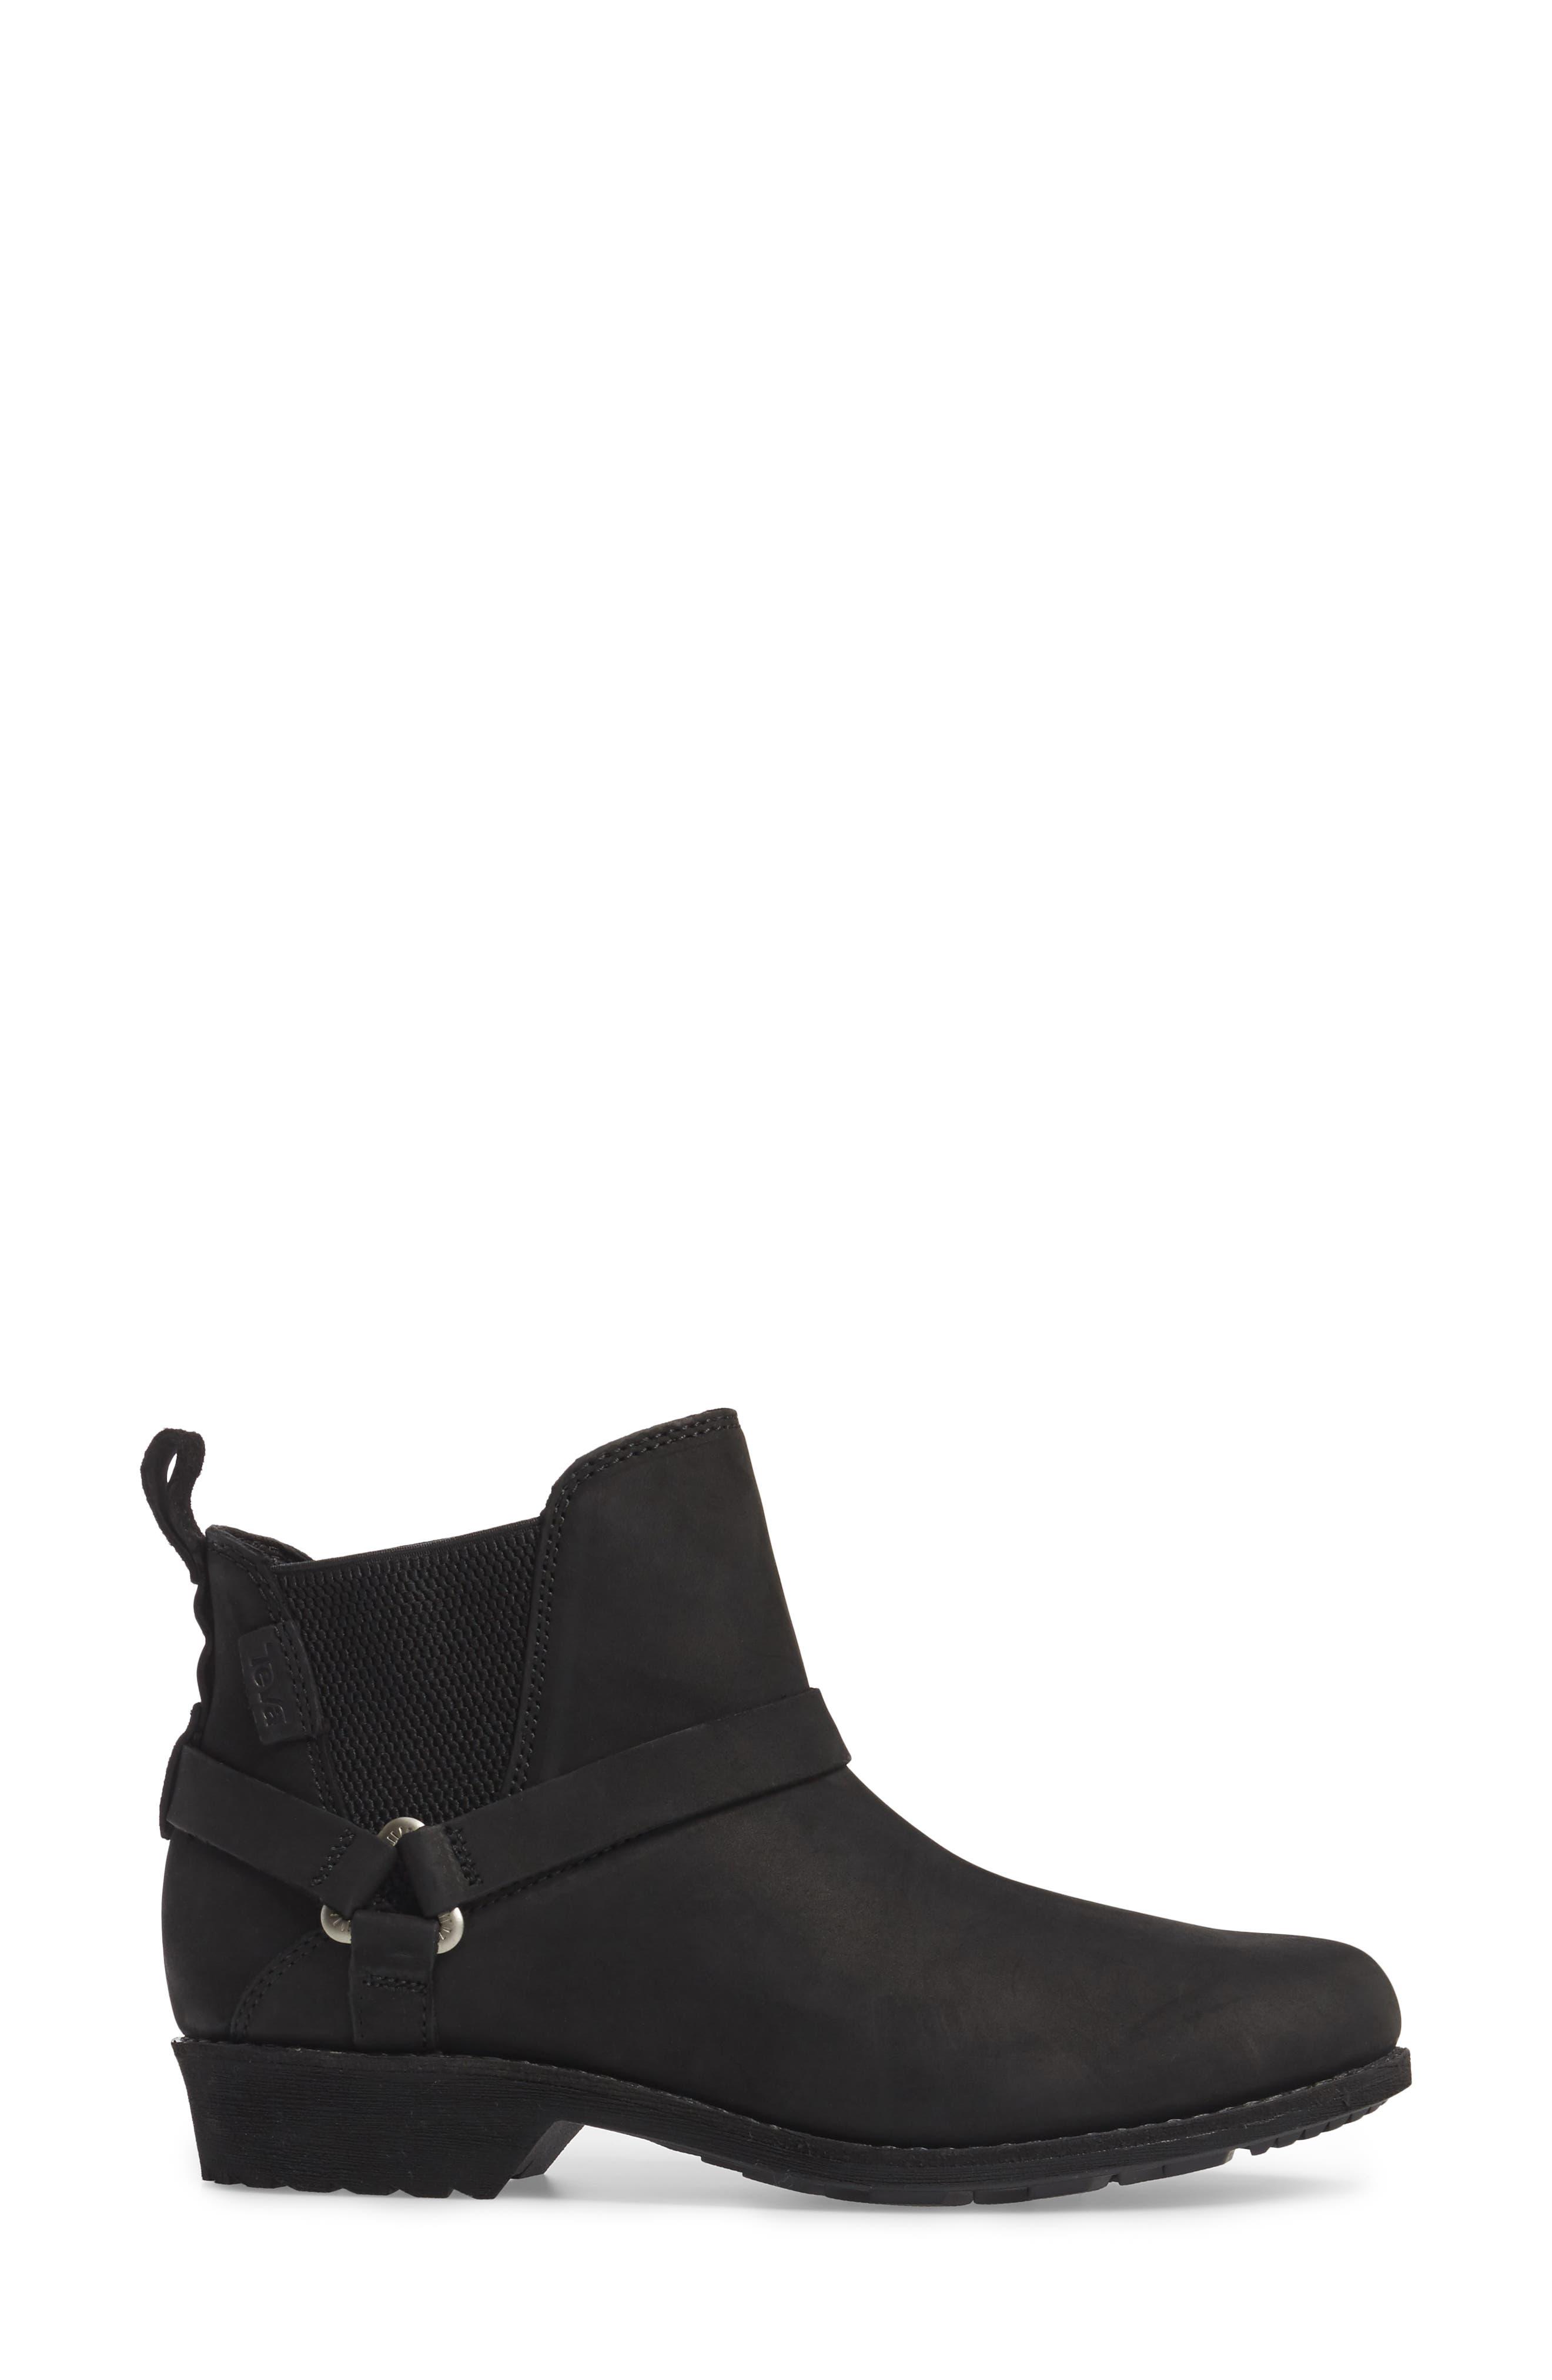 TEVA, De La Vina Dos Waterproof Chelsea Boot, Alternate thumbnail 3, color, BLACK LEATHER